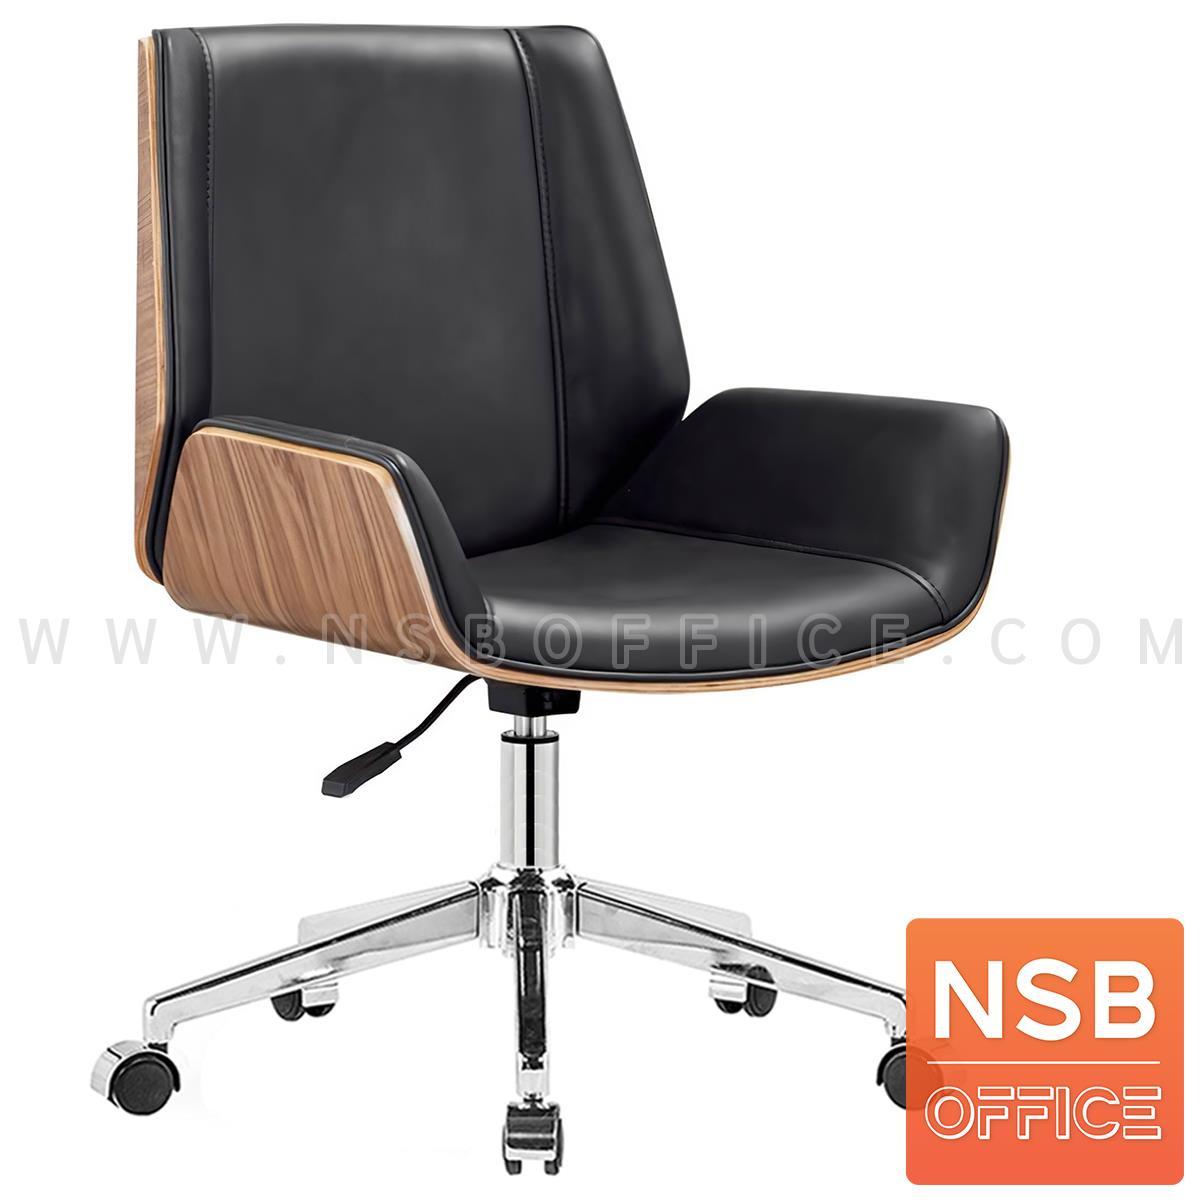 B01A542:เก้าอี้ผู้บริหาร รุ่น Capella ll (คาเพลล่า 2)  โช๊คแก๊ส ขาอลูมิเนียม